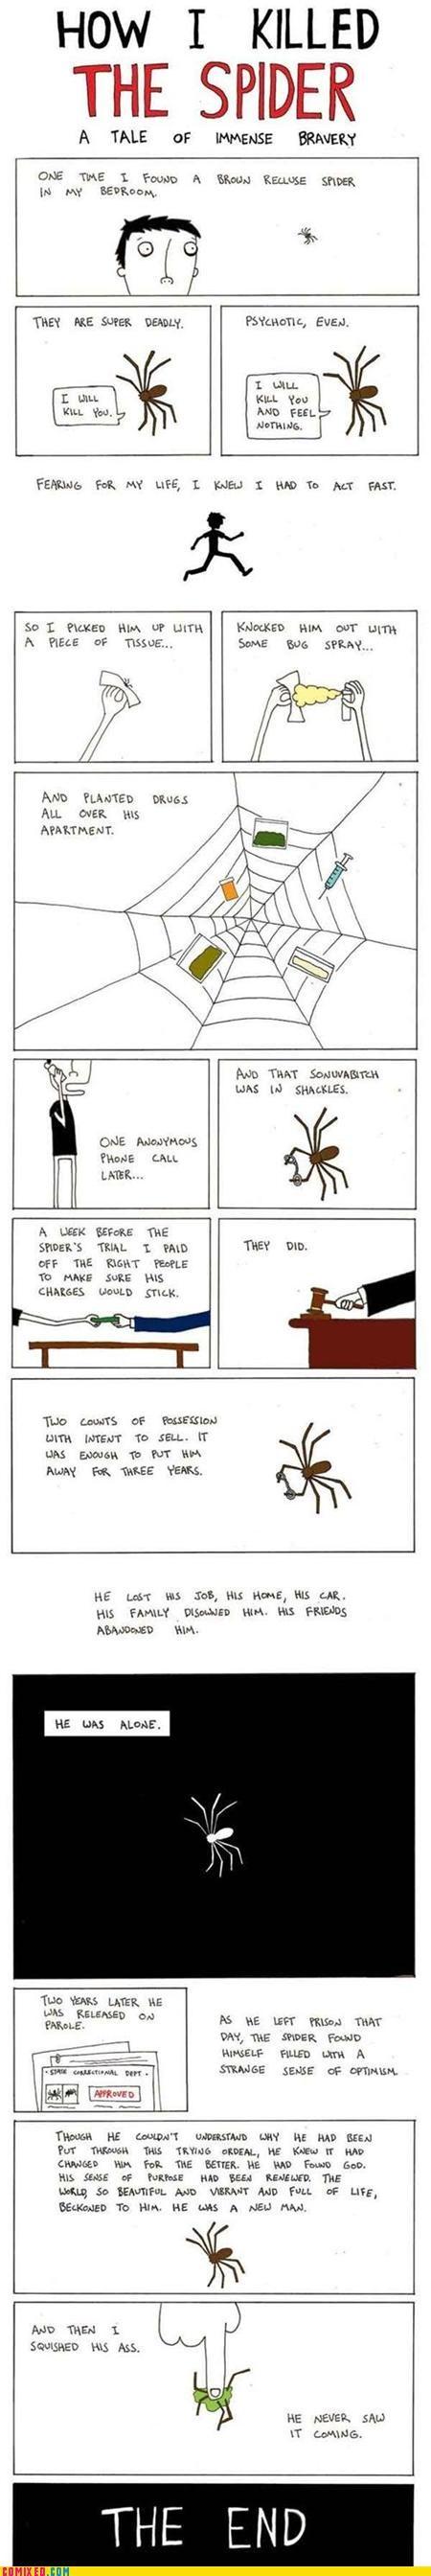 best of week killing spider the internets u mad - 5260448256